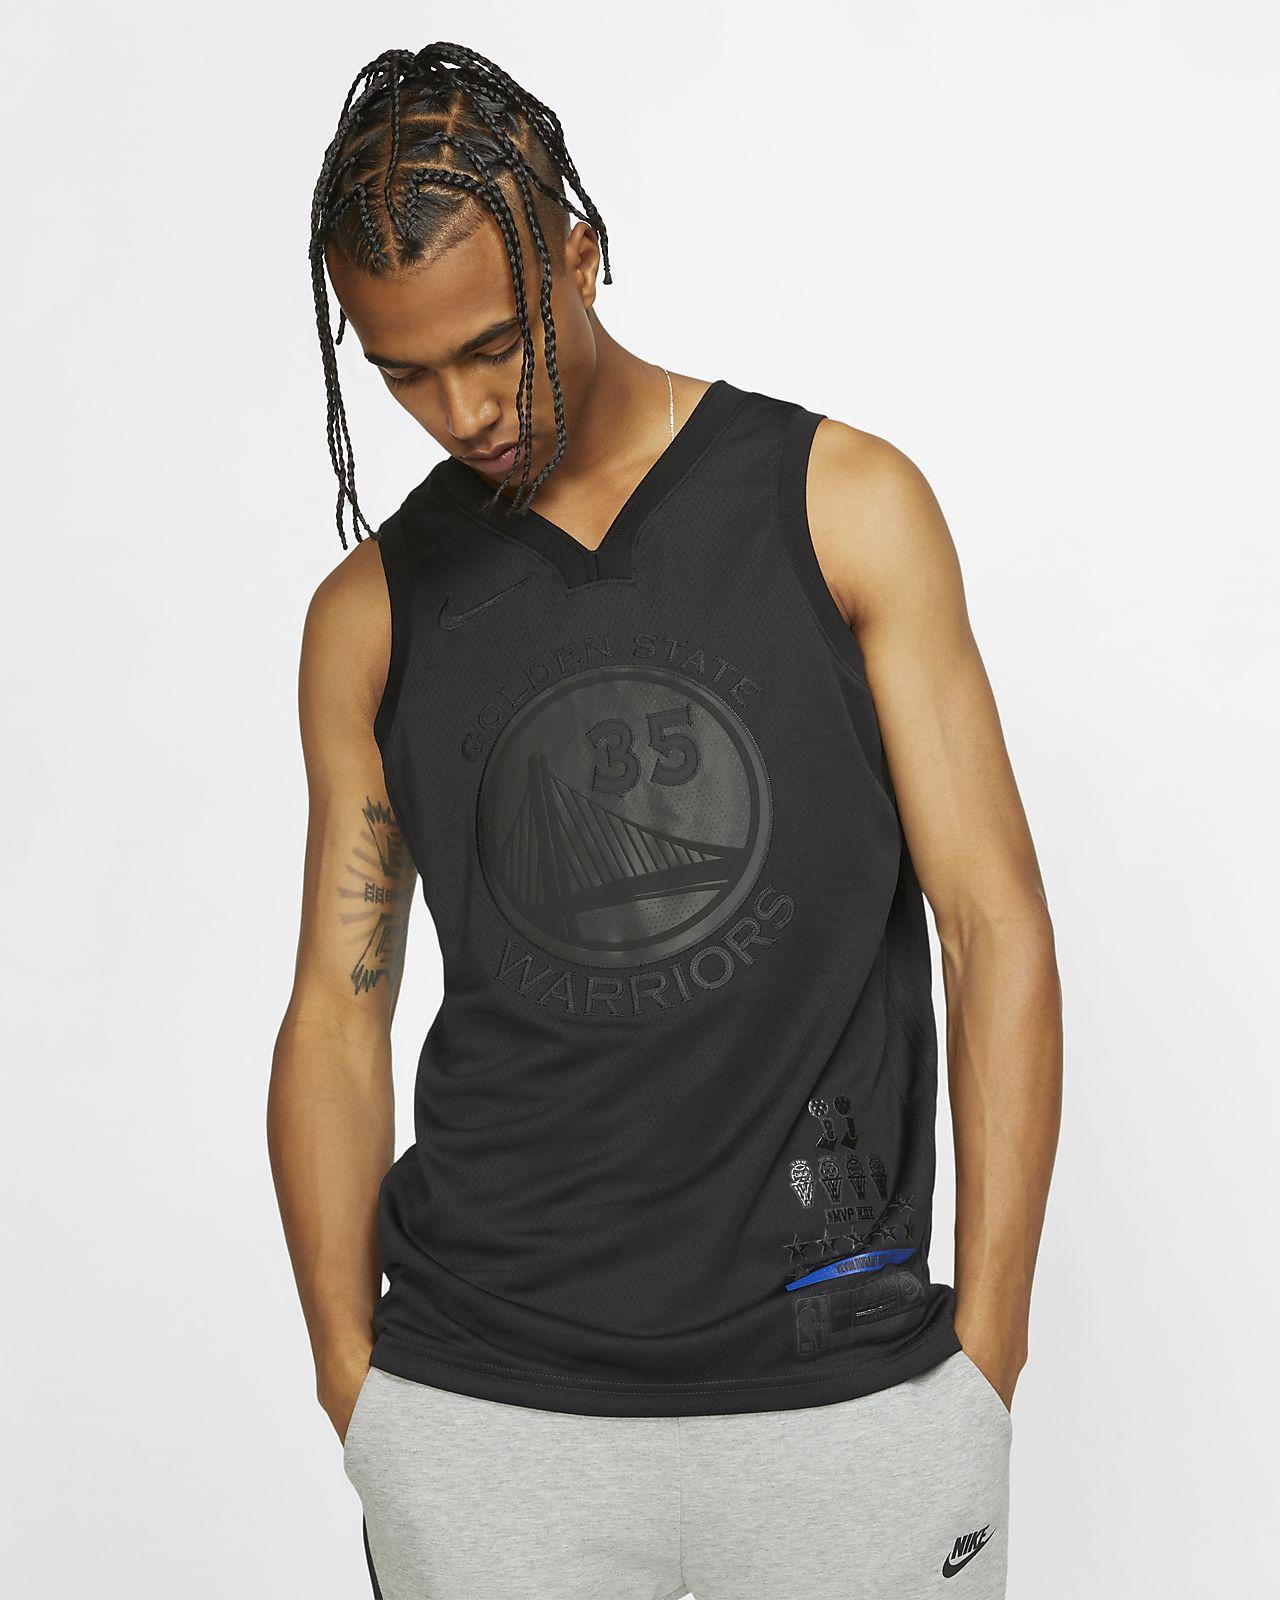 Мужское джерси Nike НБА Kevin Durant MVP Swingman (Golden State Warriors) с технологией NikeConnect